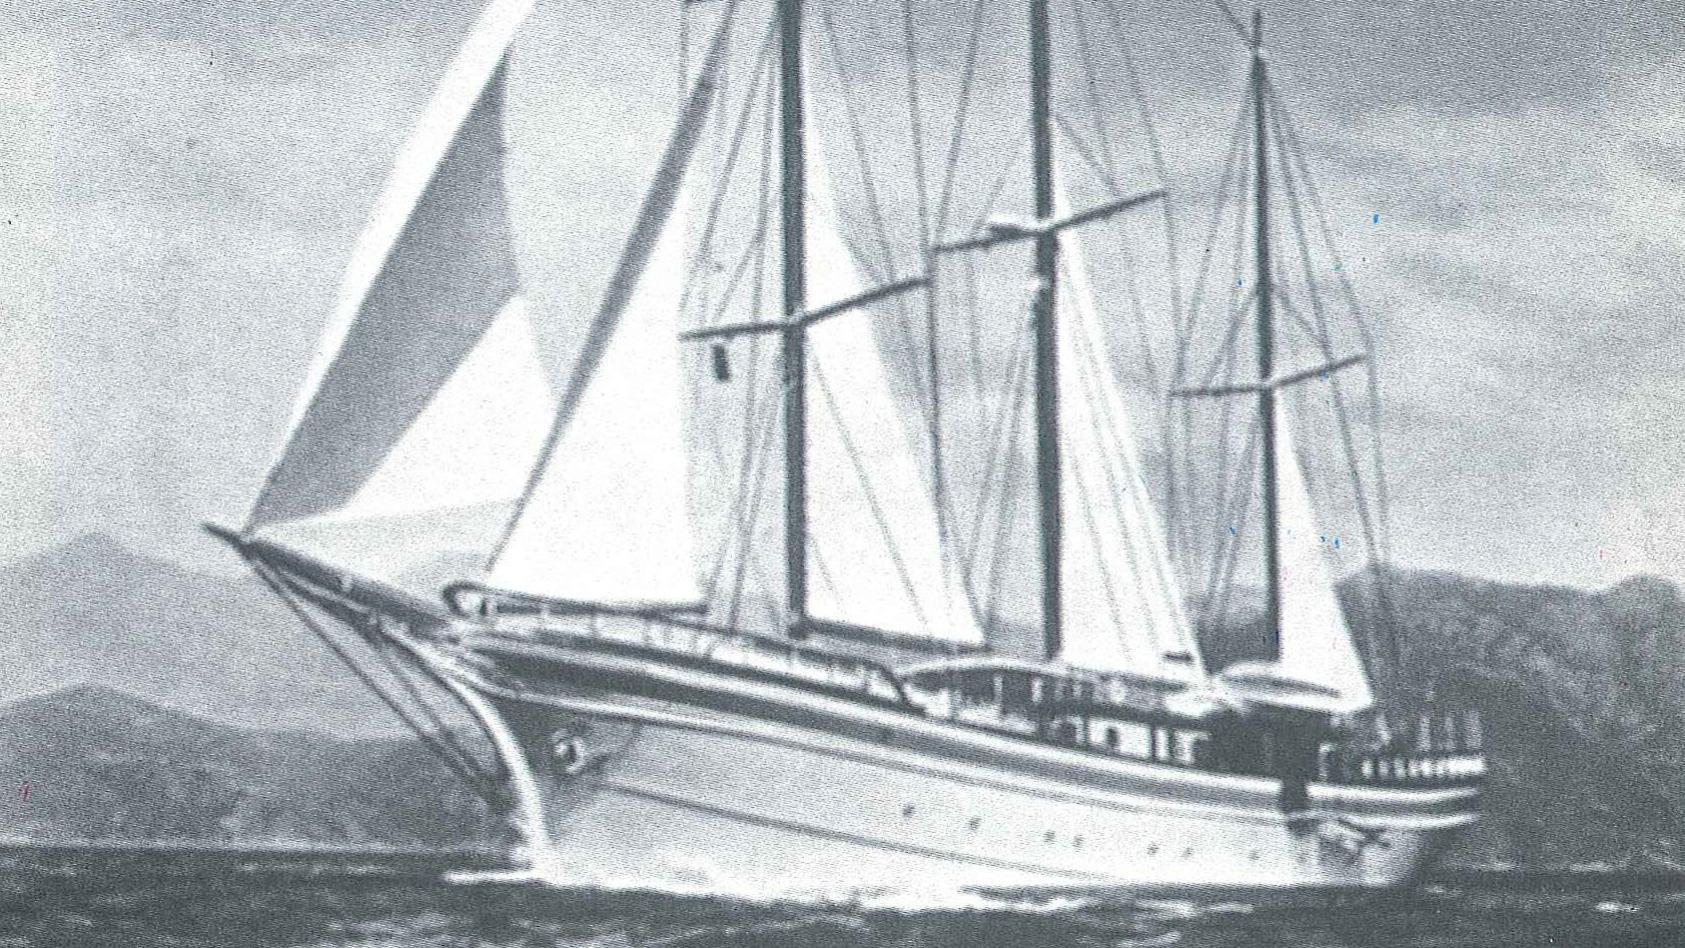 Tritona classic yacht profile